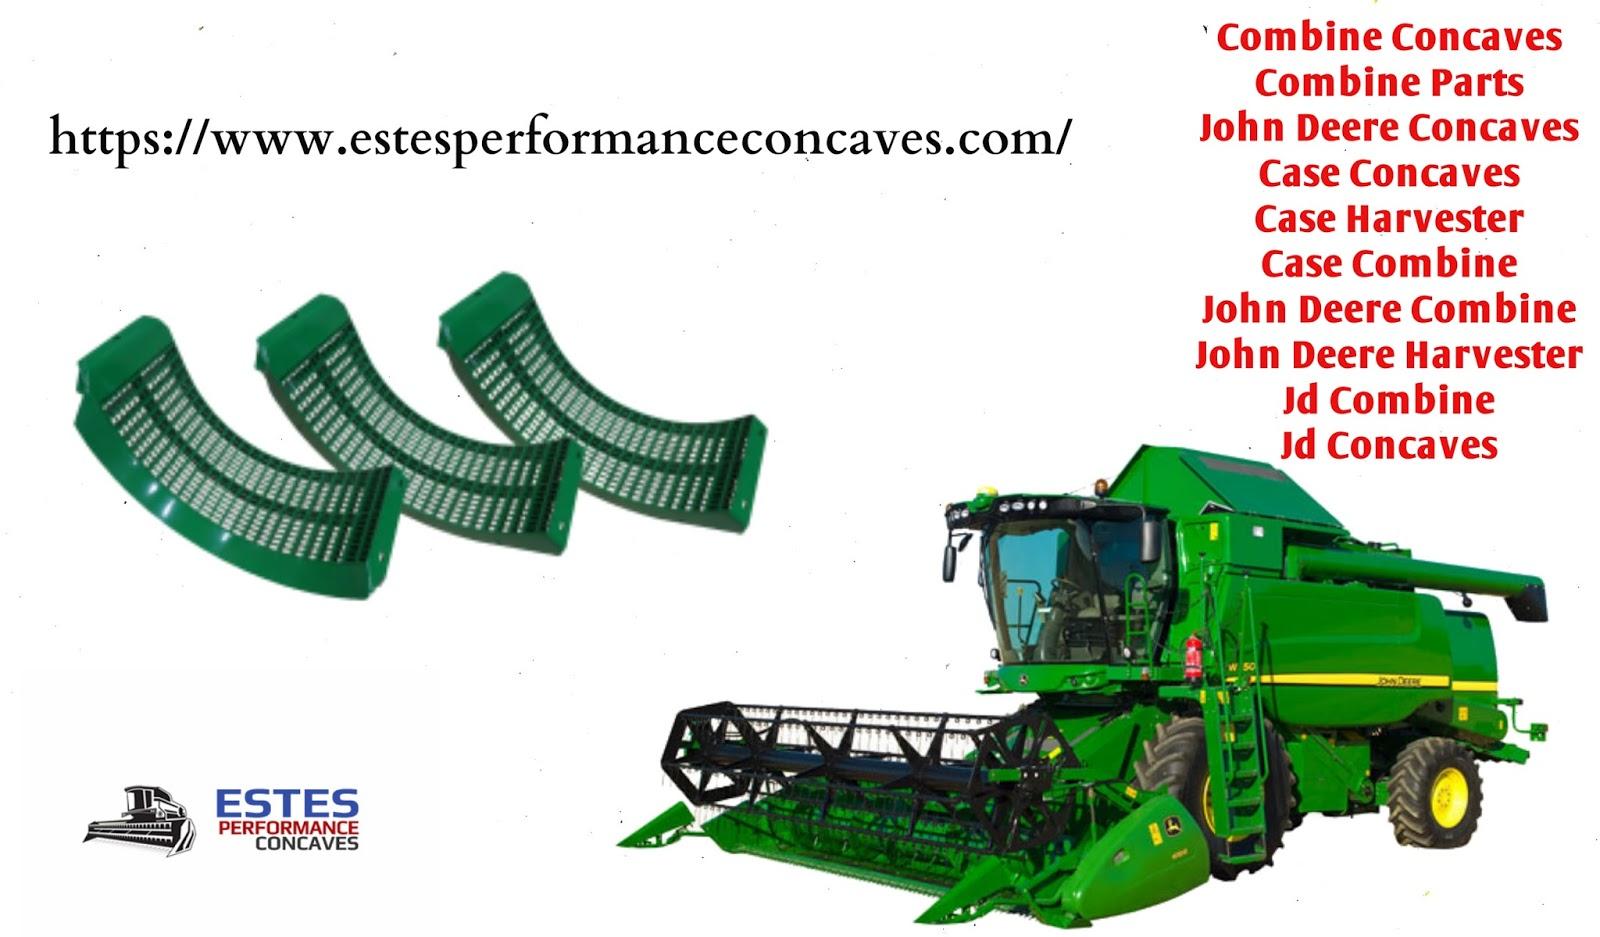 Case Combine Parts 1070 Wiring Diagram John Deere Concaves Upgrade Rh Johndeereconcaves Blogspot Com World Wide Uk